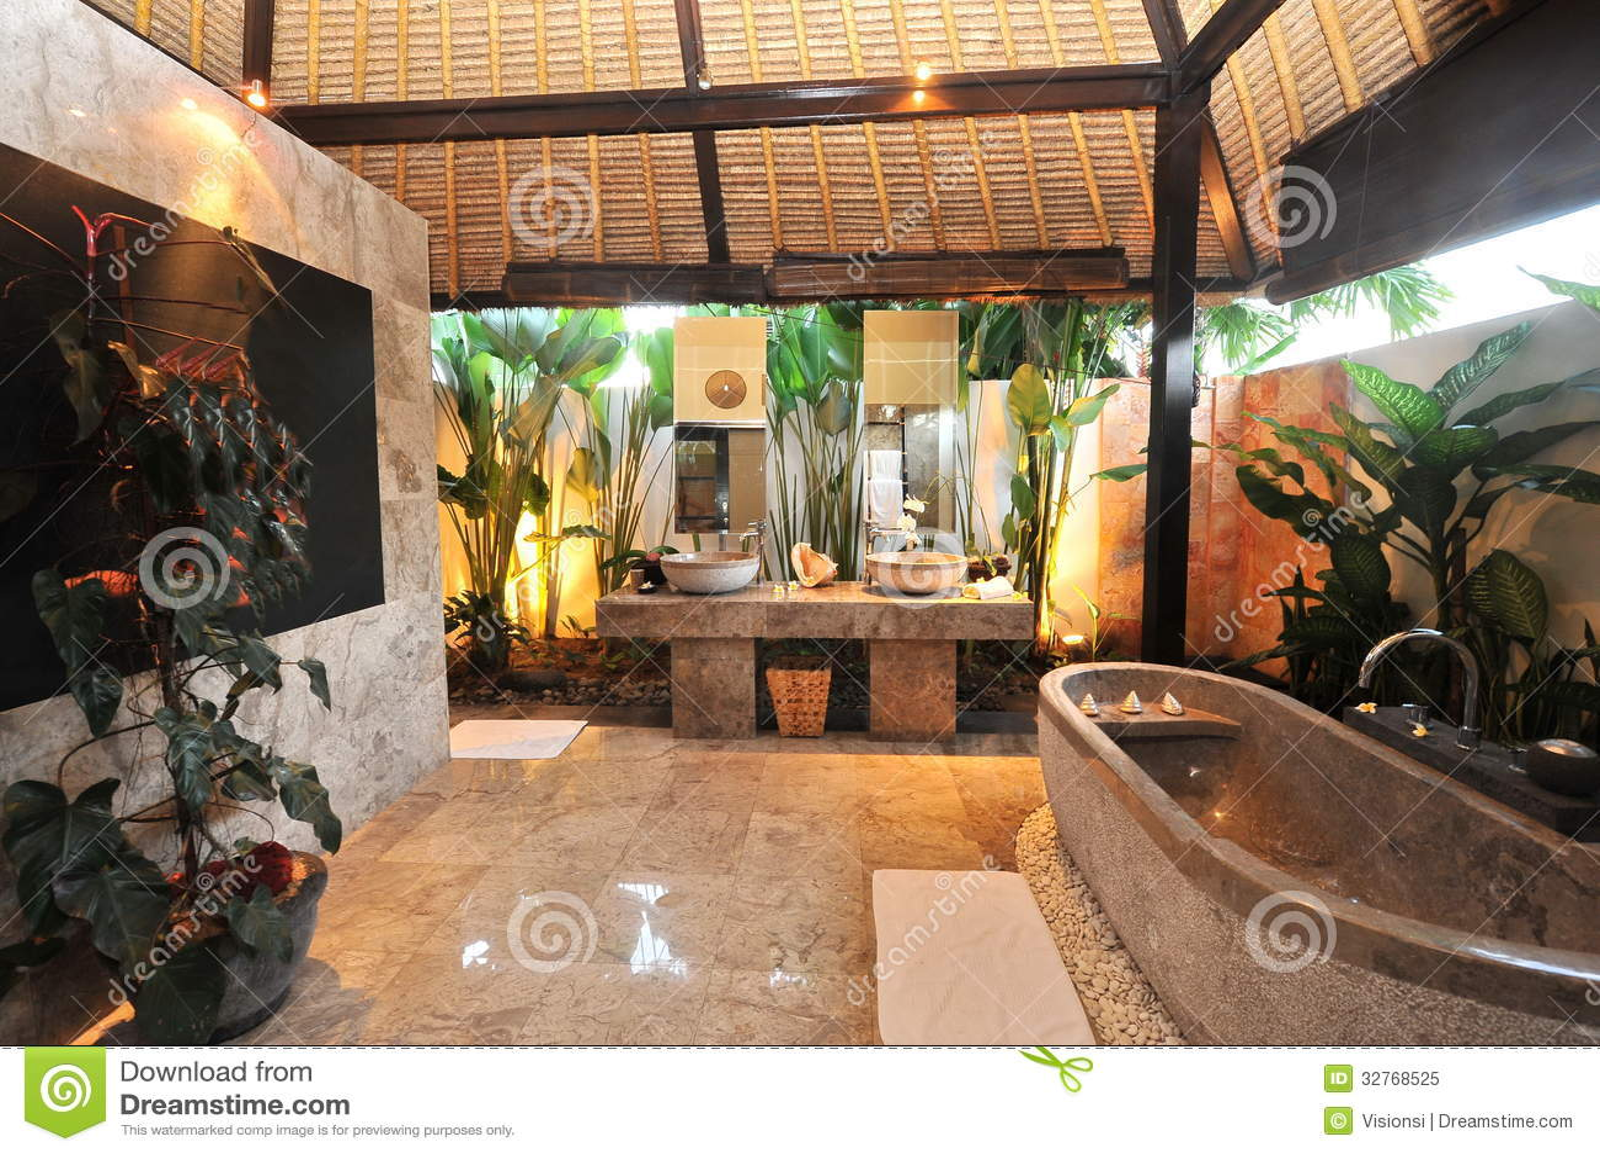 Tropical Luxury Hotel Bedroom : Tropical Luxury Hotel Bedroom Luxury room bathroom in a